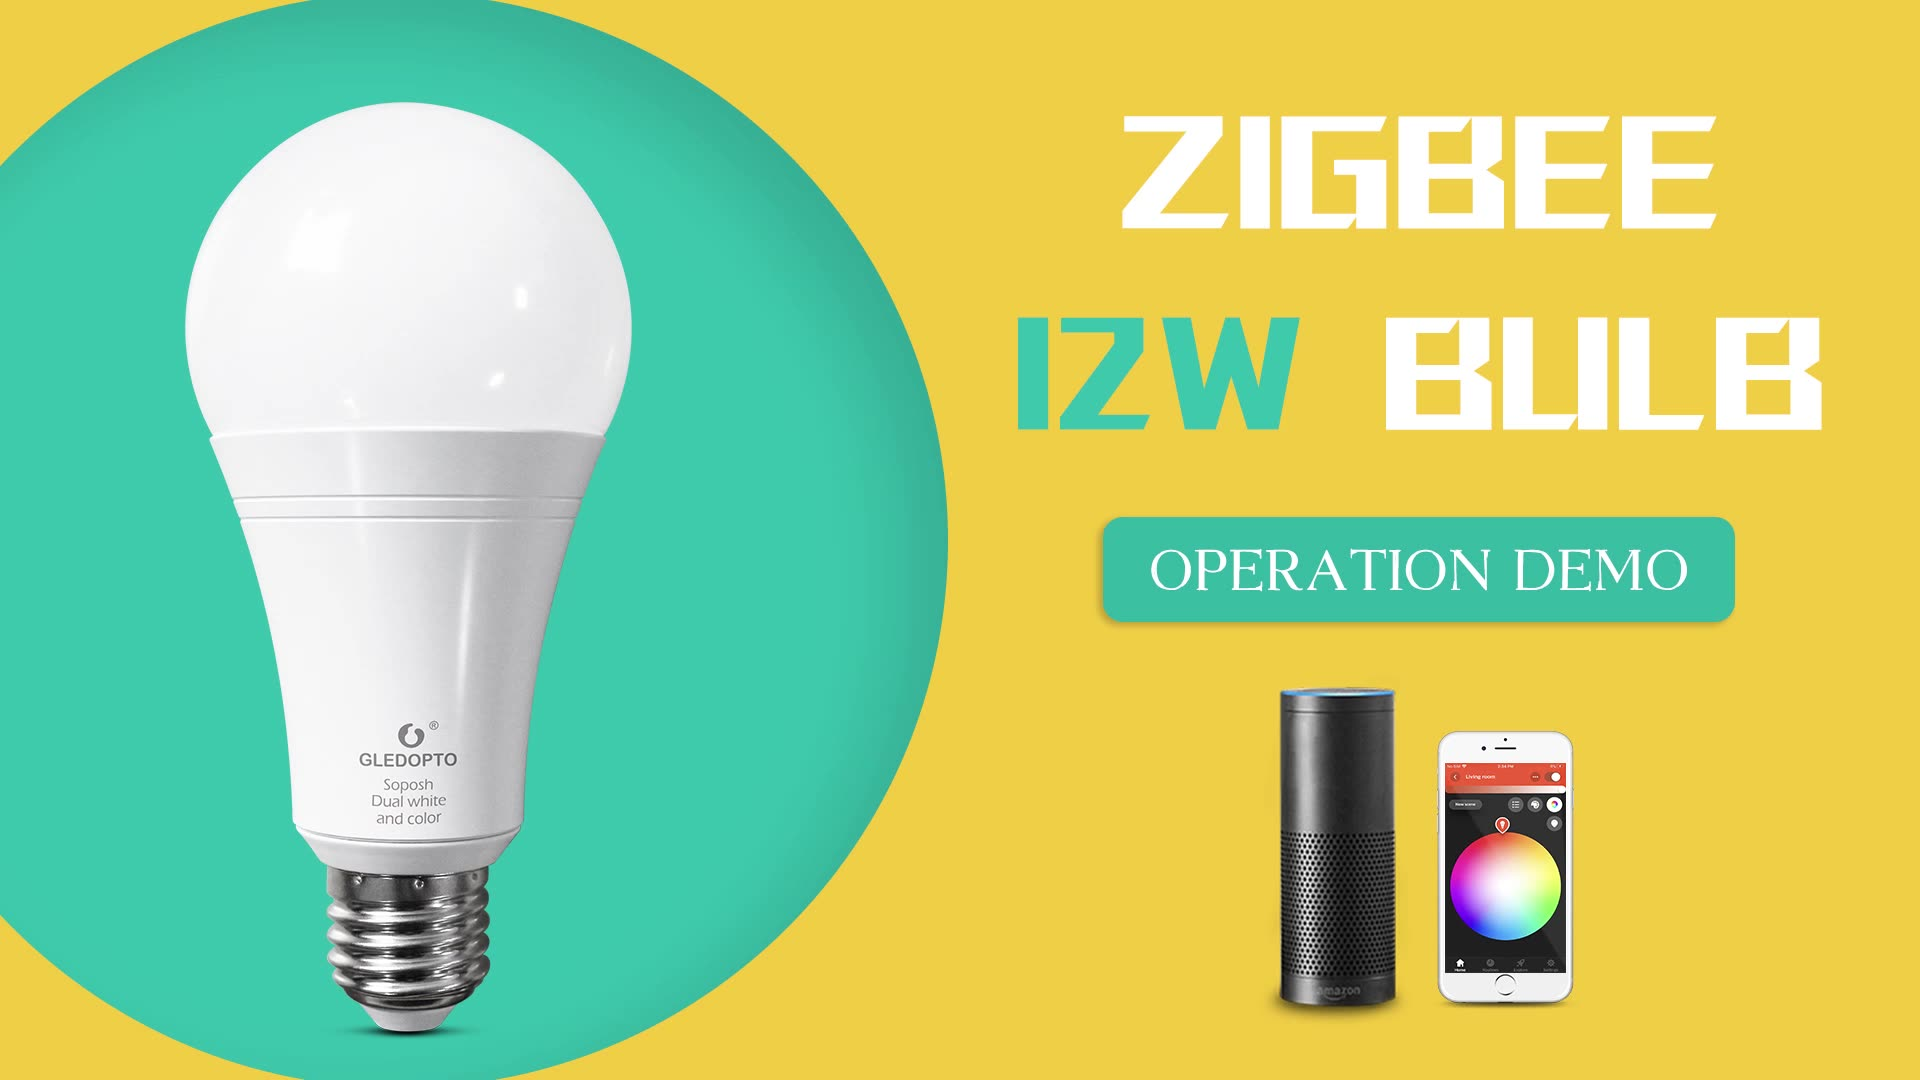 ZigBee ambient light motion sensor control multi-color E27 E14 led Bulb with manual remotes US market